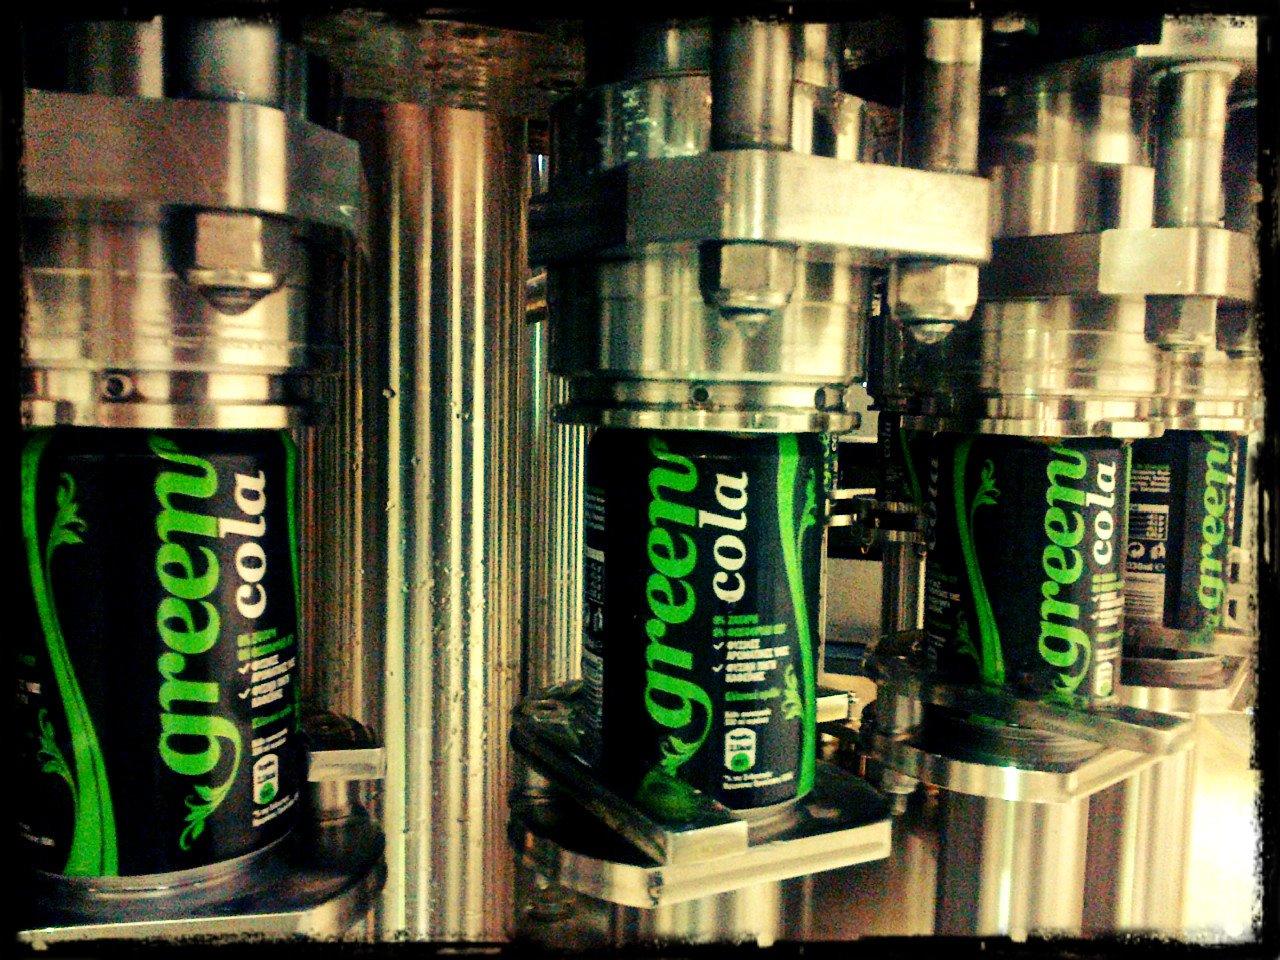 Green Cola: Κάτι περισσότερο από μία ακόμη cola στο ράφι